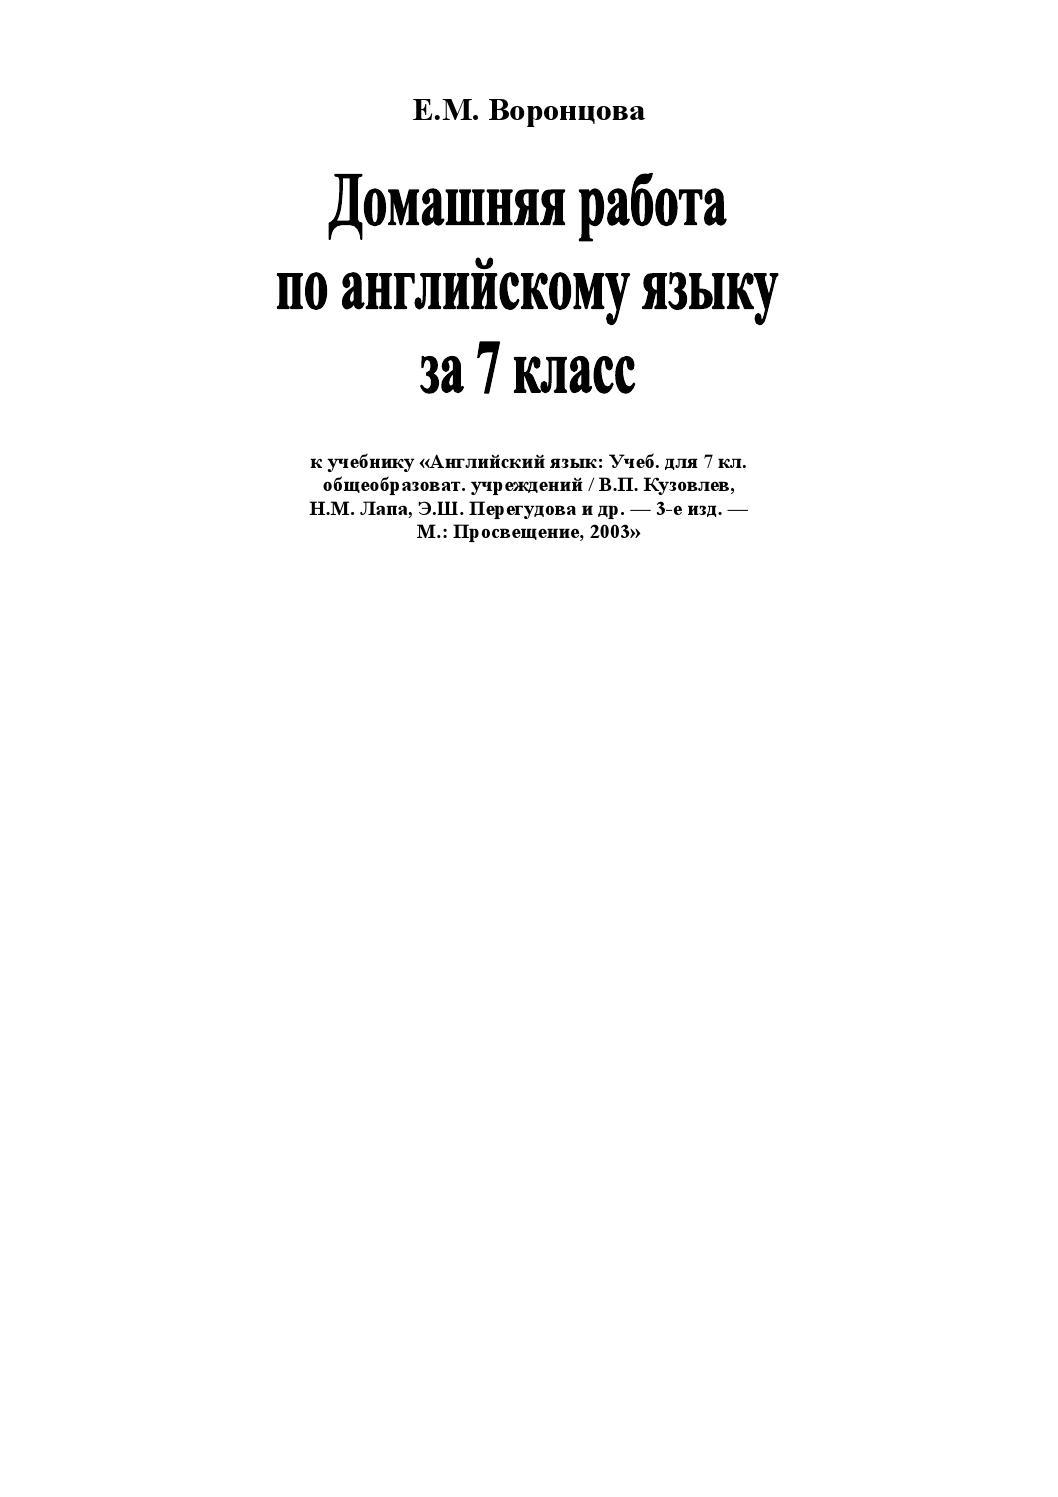 cb228d03d7f0 Английский язык, 7 класс Кузовлев В.П., Лапа Н.М., Перегудова Э.Ш. 2012  год. by Alexander Demidov - issuu